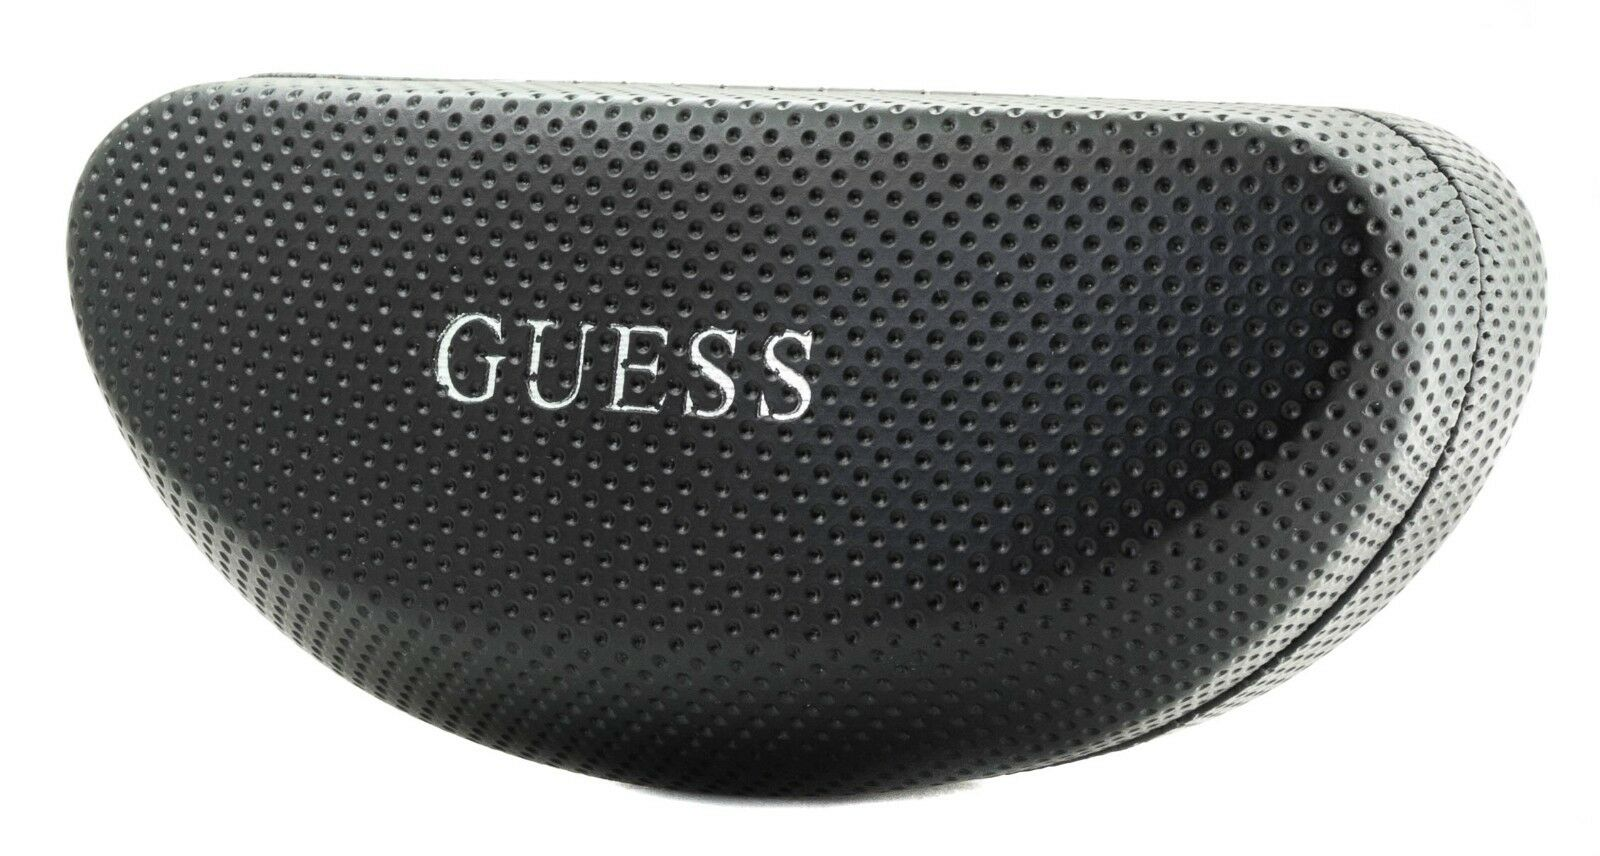 GUESS GU 6816 J54 Sunglasses Shades Fast Shipping BNIB BNIB BNIB - Brand New in Case     | Ausgezeichnetes Handwerk  9ff869